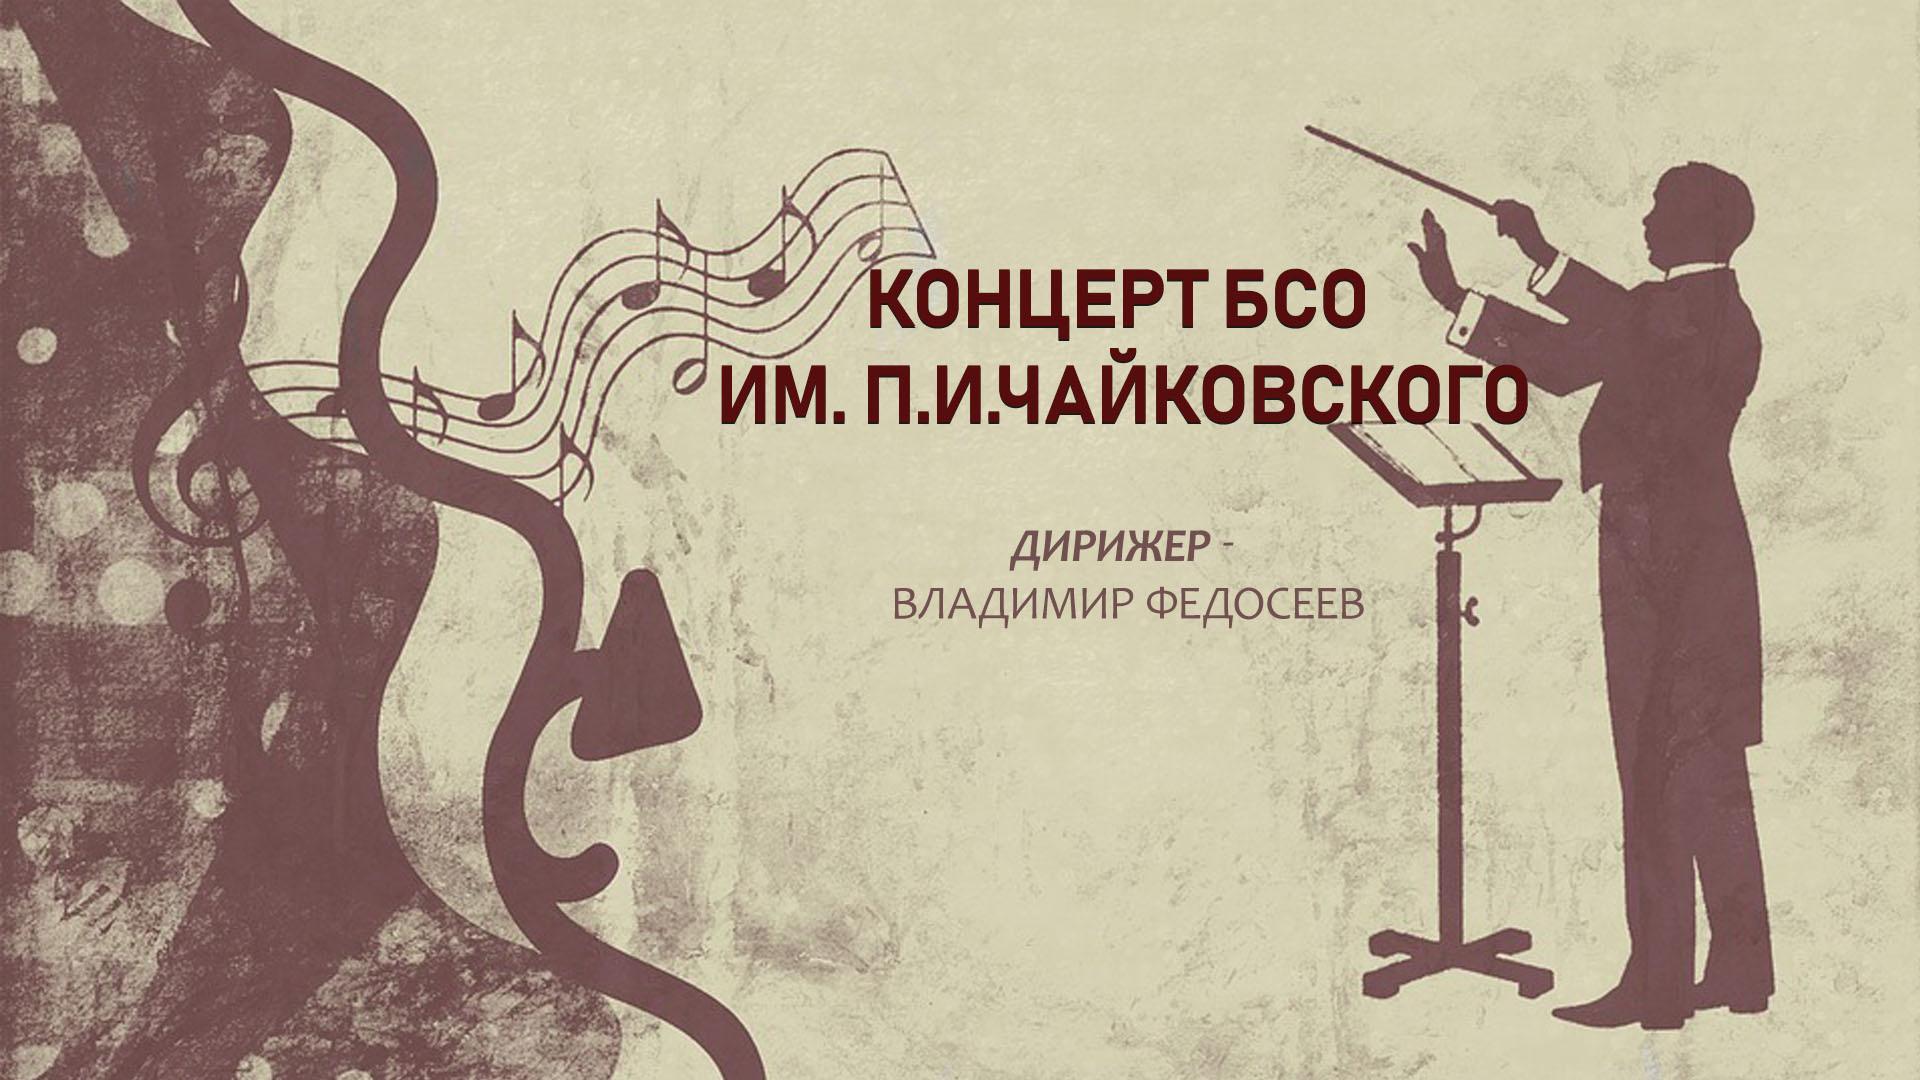 Концерт БСО им. П.И.Чайковского. Дирижер – Владимир Федосеев